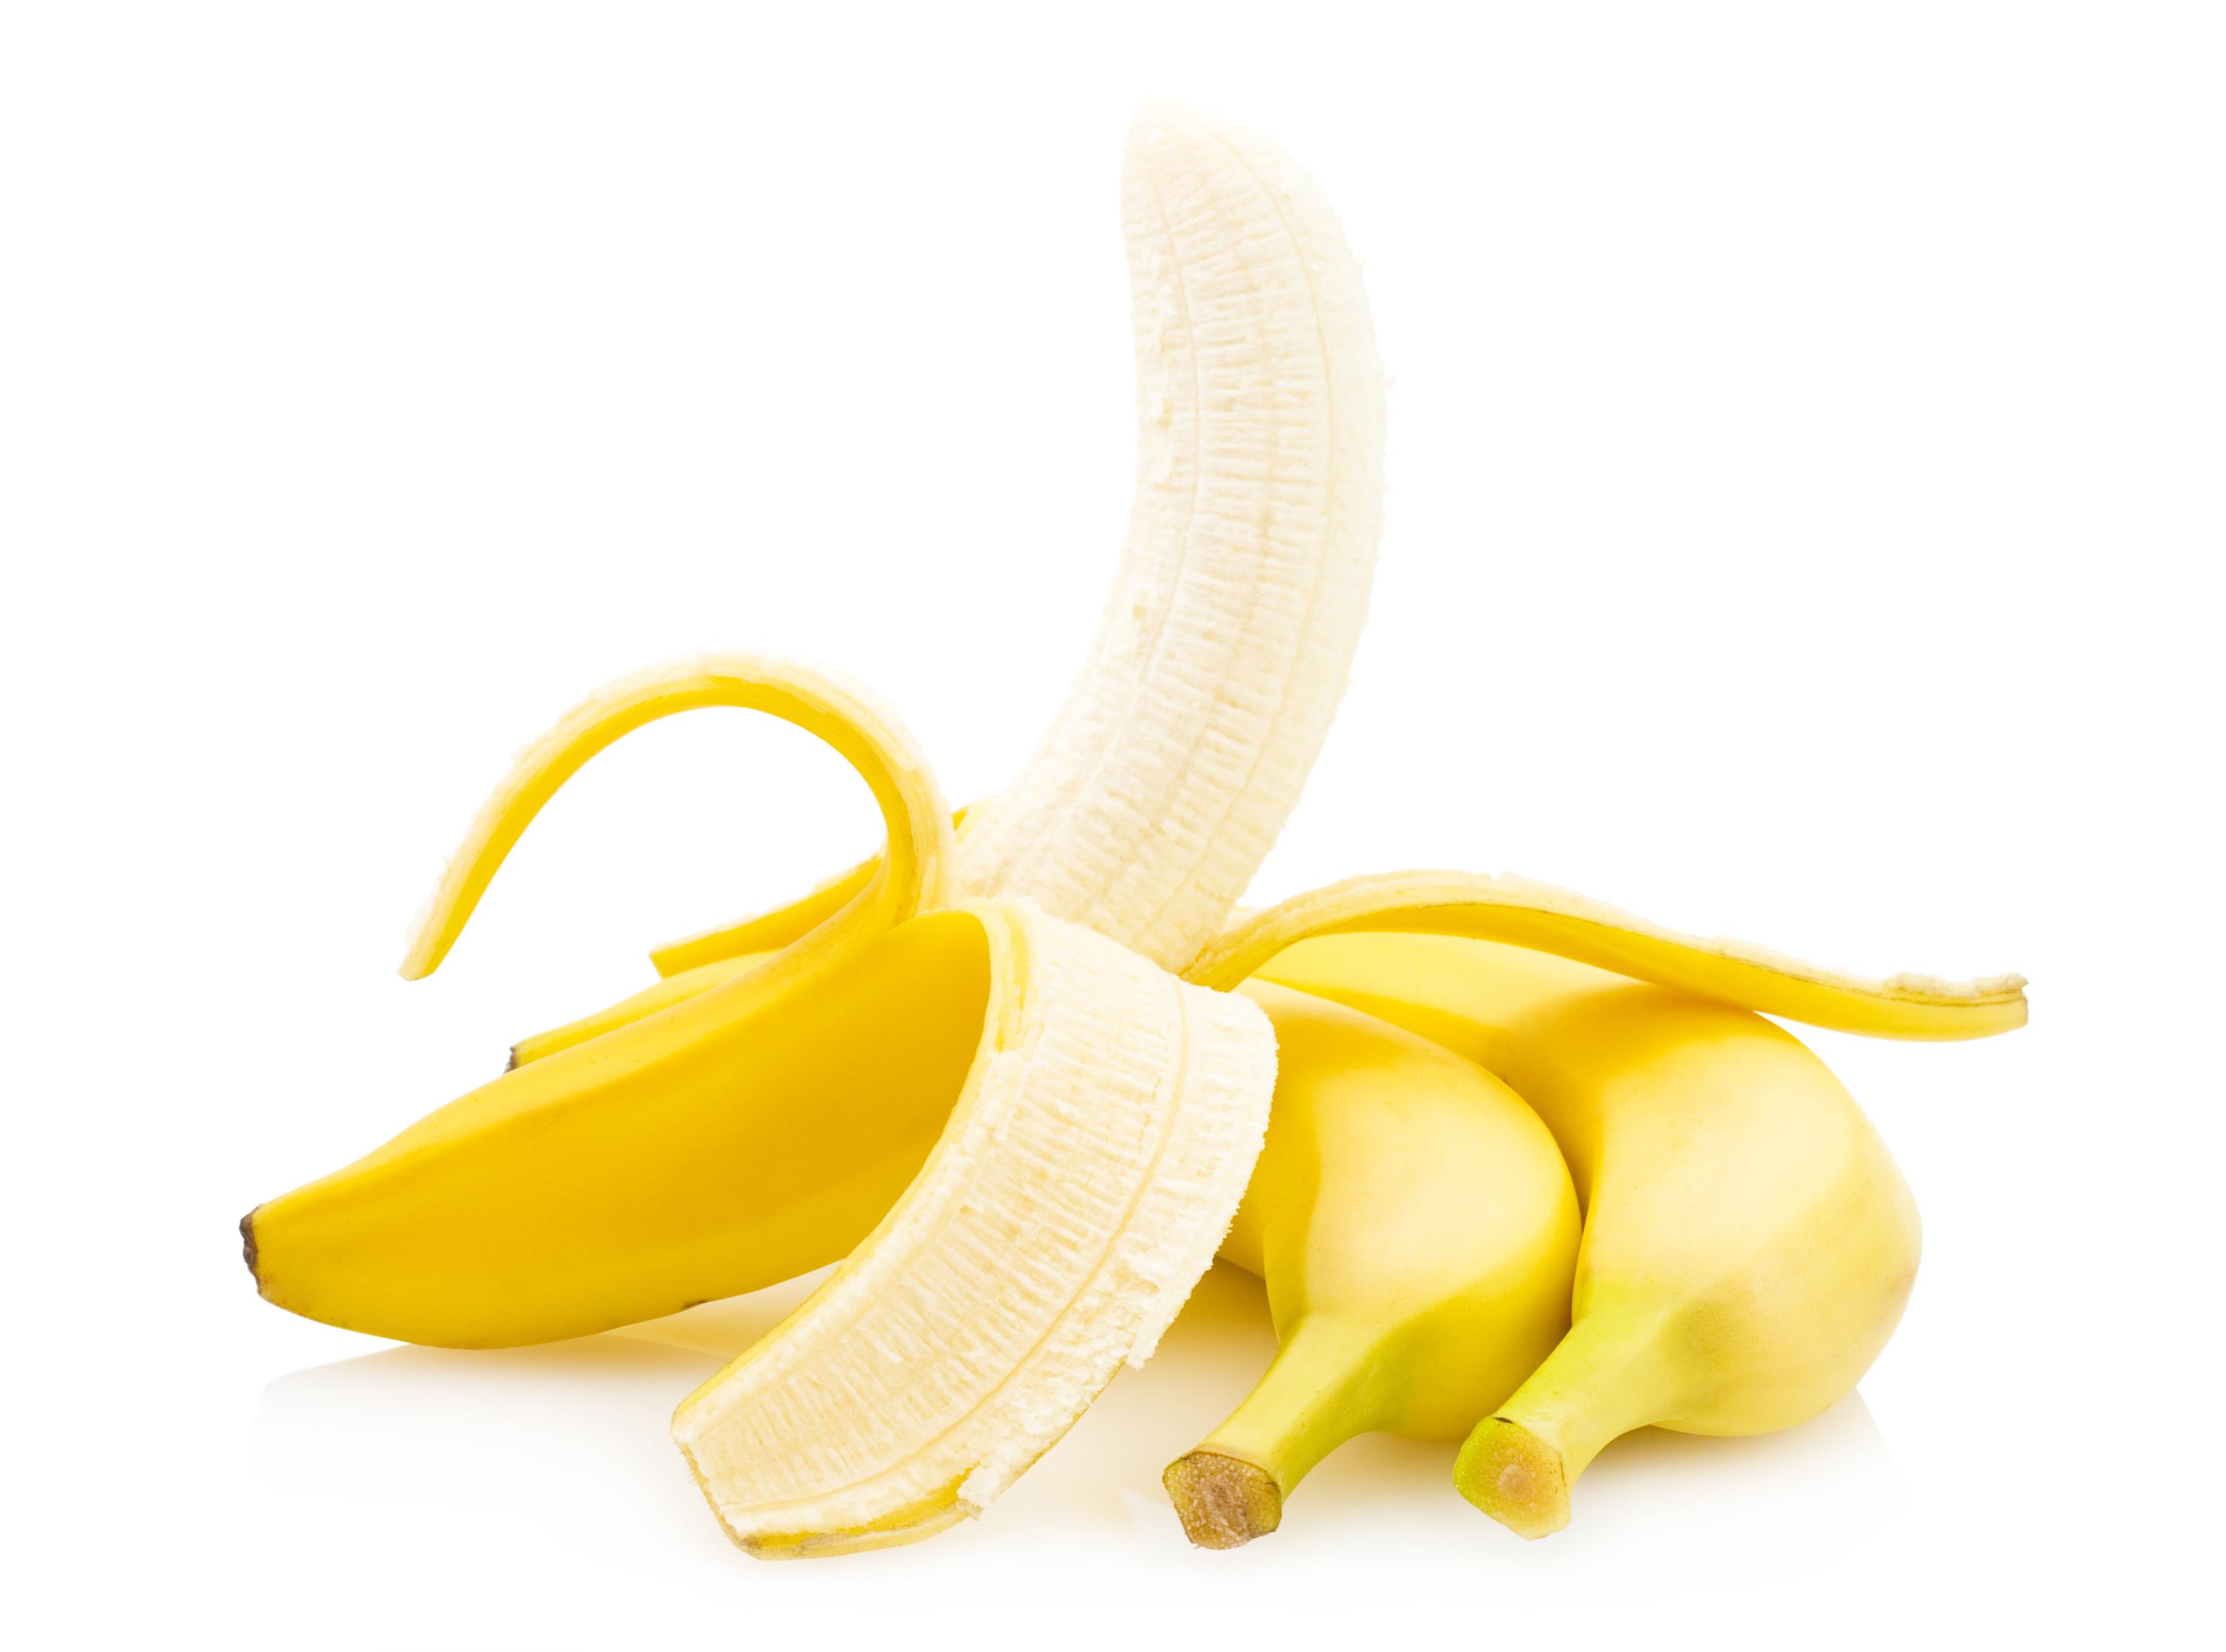 Peeled Banana, Skin, Nutrition, Organic, Peel, HQ Photo